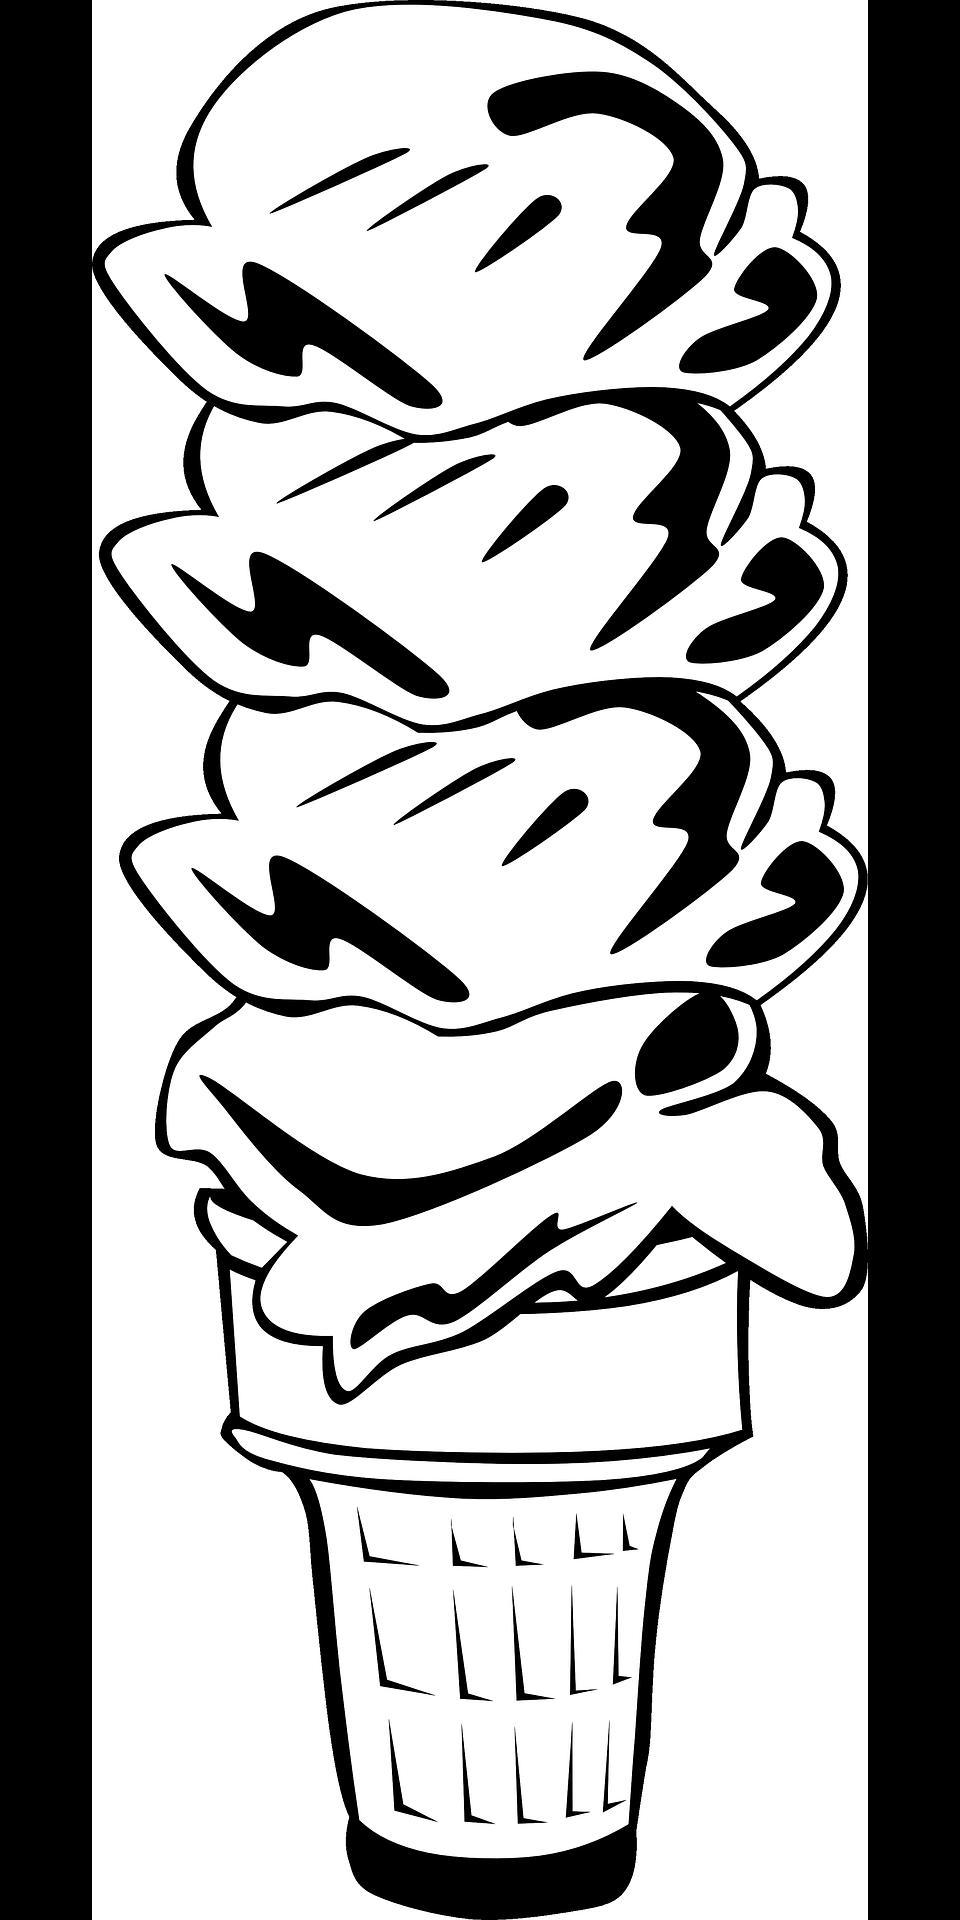 960x1920 Ice Cream Cone Food Dessert Black White Drawing Free Image